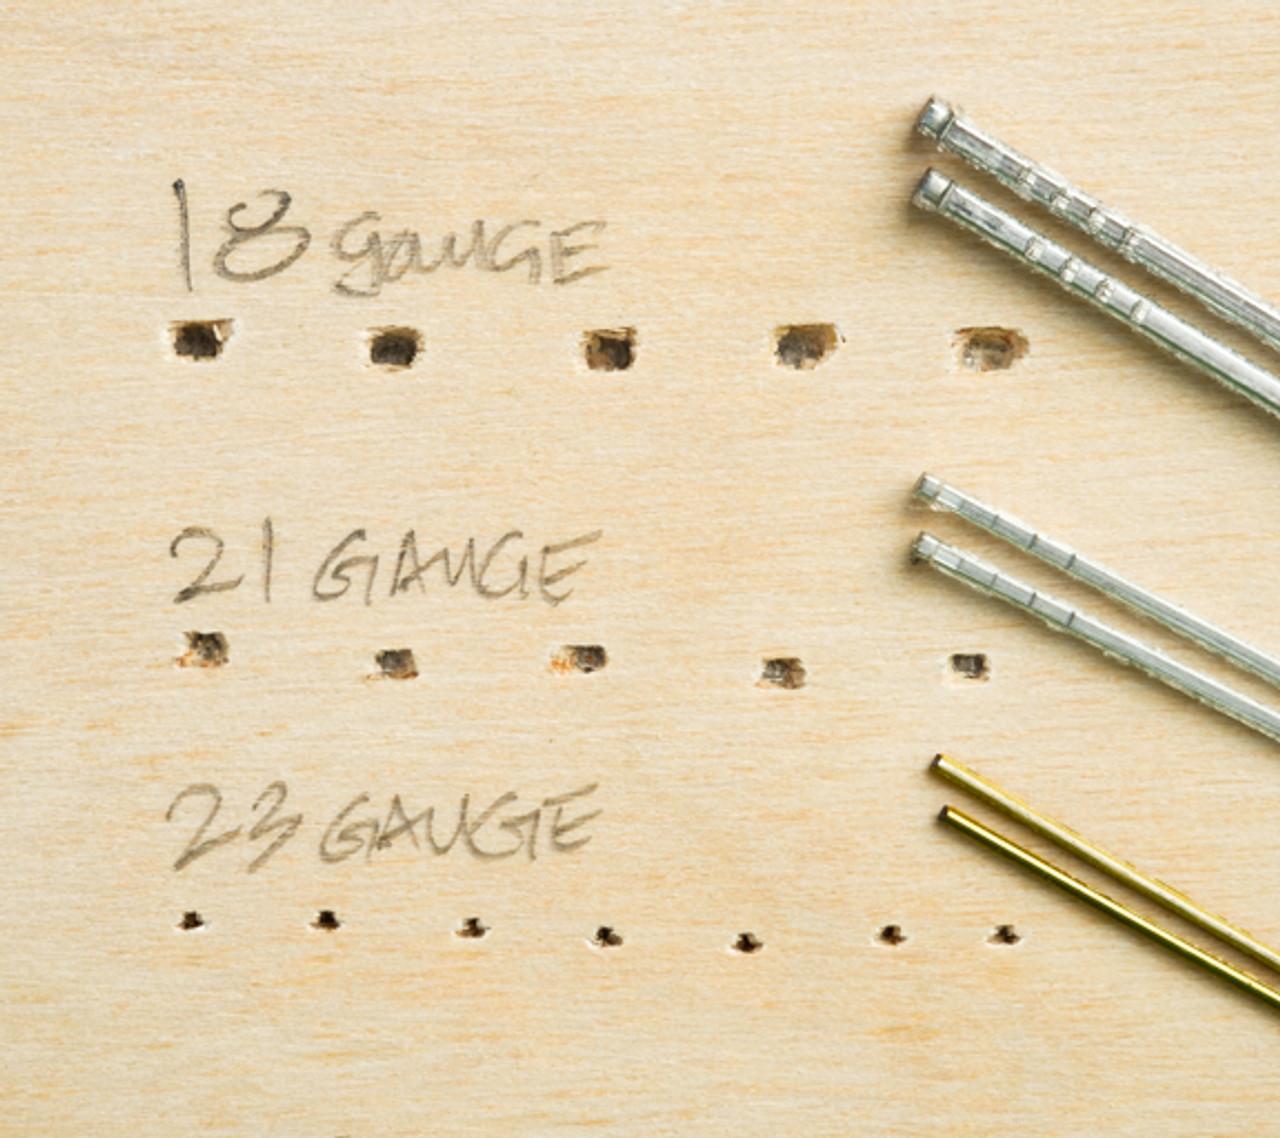 "Grex 21 Gauge 2"" Length Brad Nailer - H850LX"